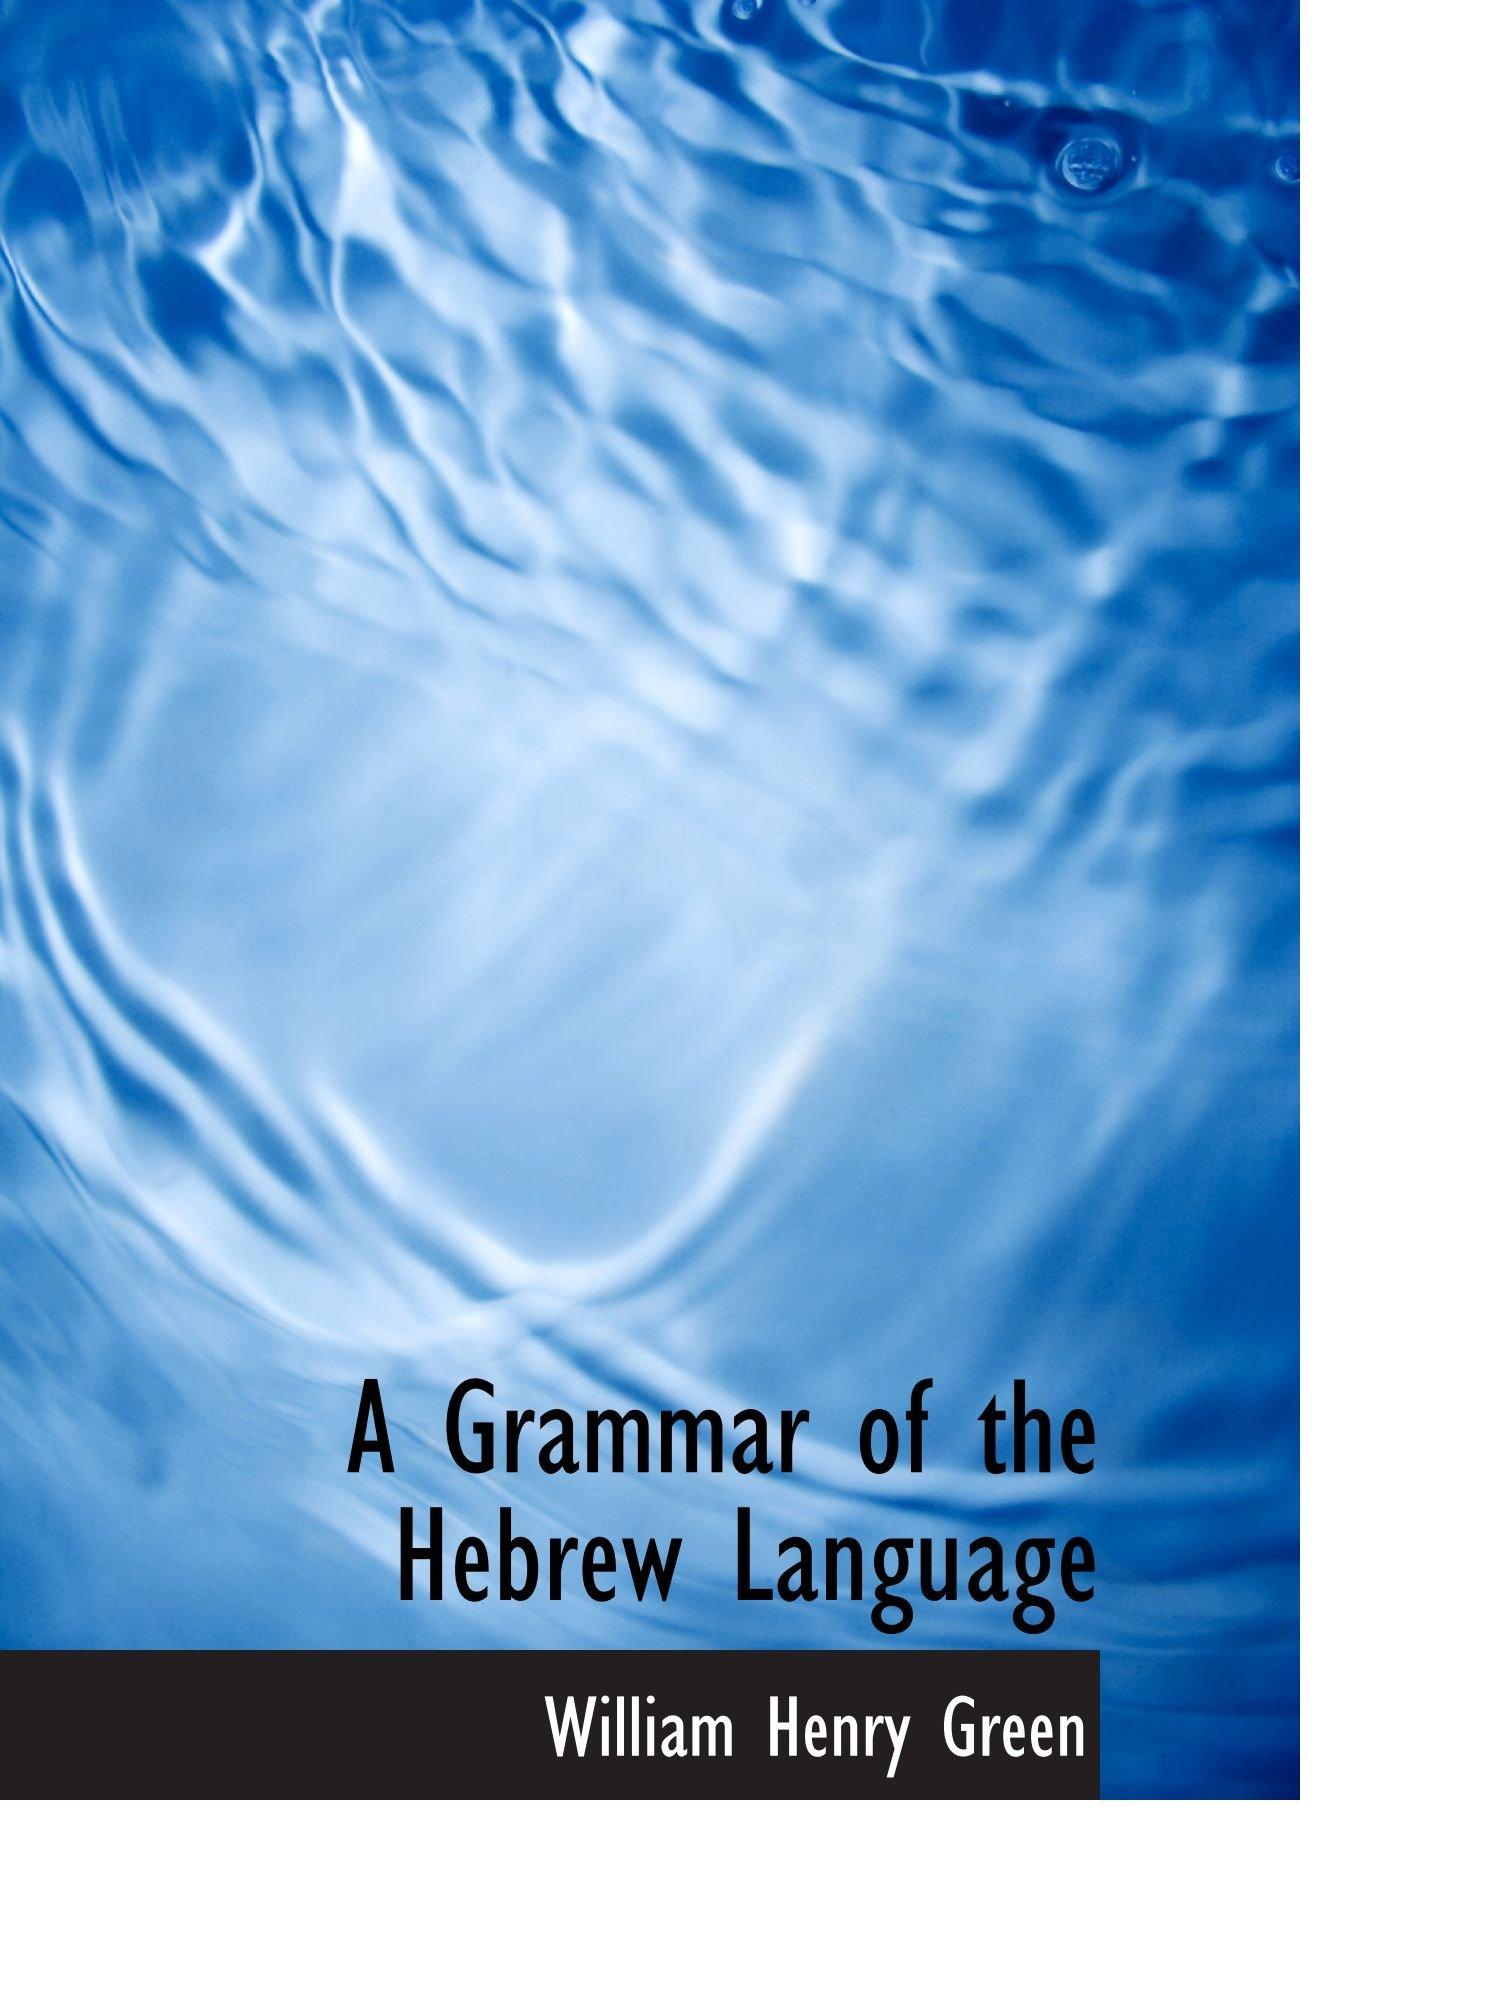 A Grammar of the Hebrew Language by BiblioBazaar